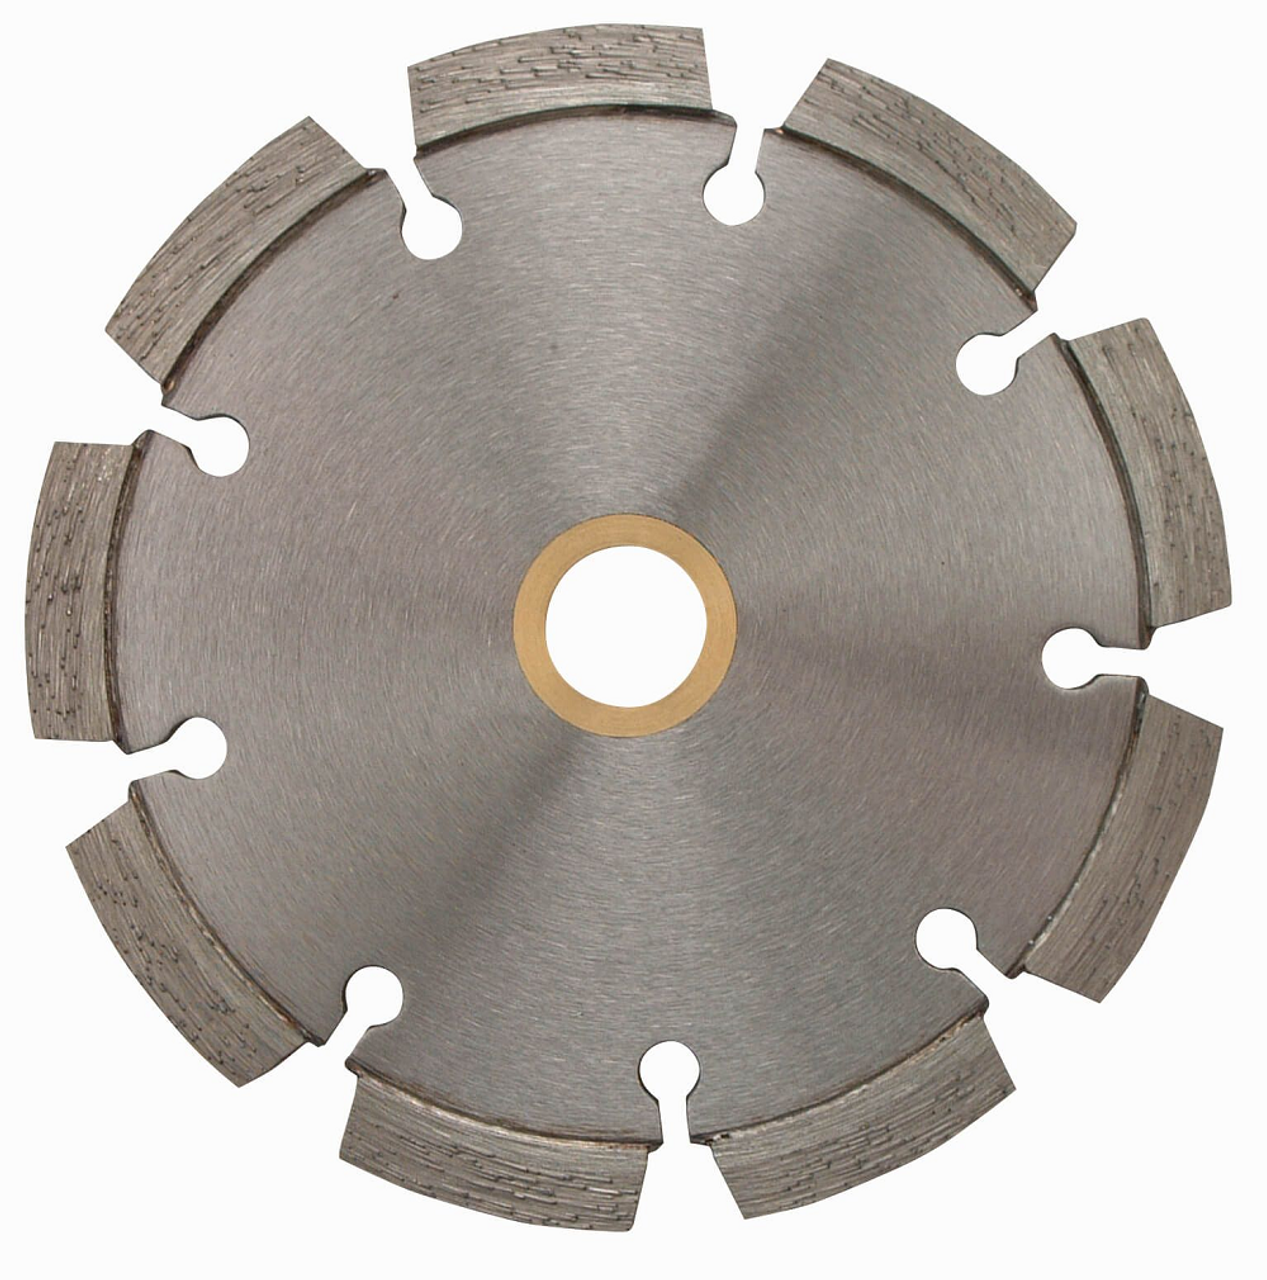 "Concrete Masonry 5/"" x .250 High Quality Tuck Pointing Blades for Mortar"